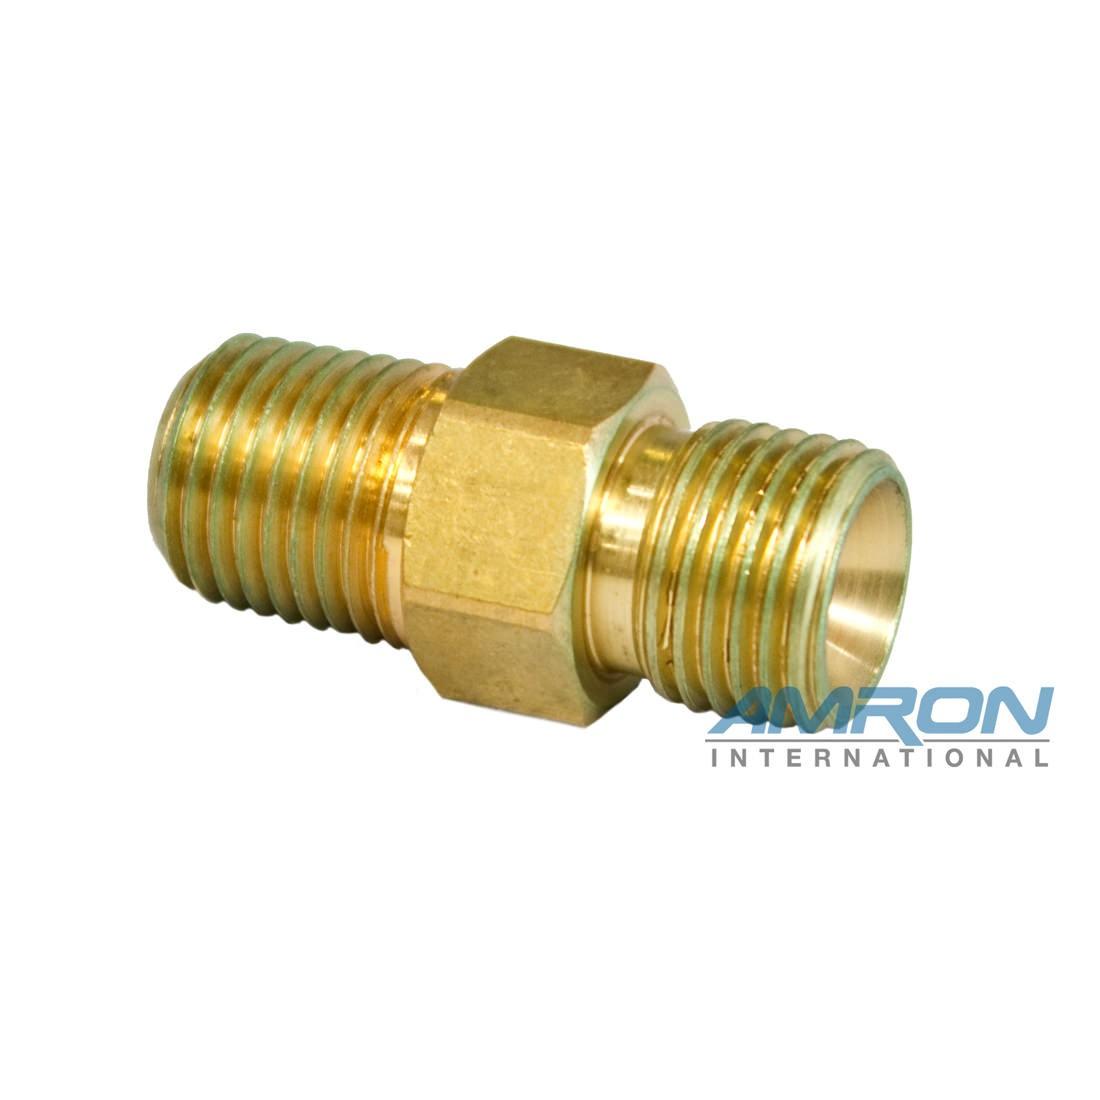 Kirby Morgan 555-117 1/4 in. Brass Adapter